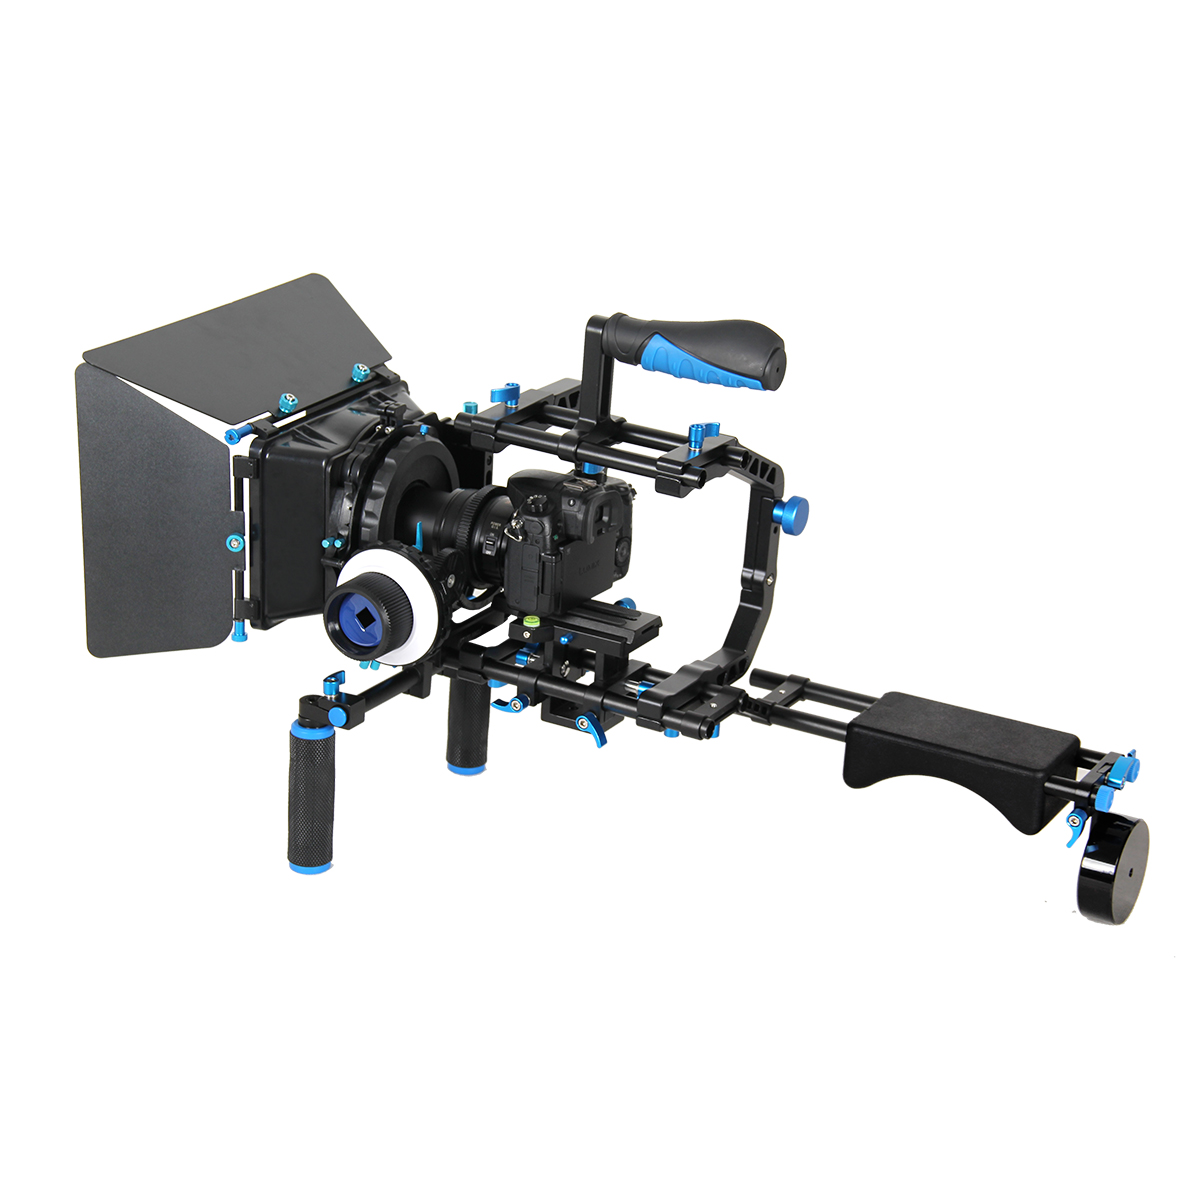 YELANGU Top Handle DSLR Shoulder Mount Rig Kit With Follow Focus, Matte Box